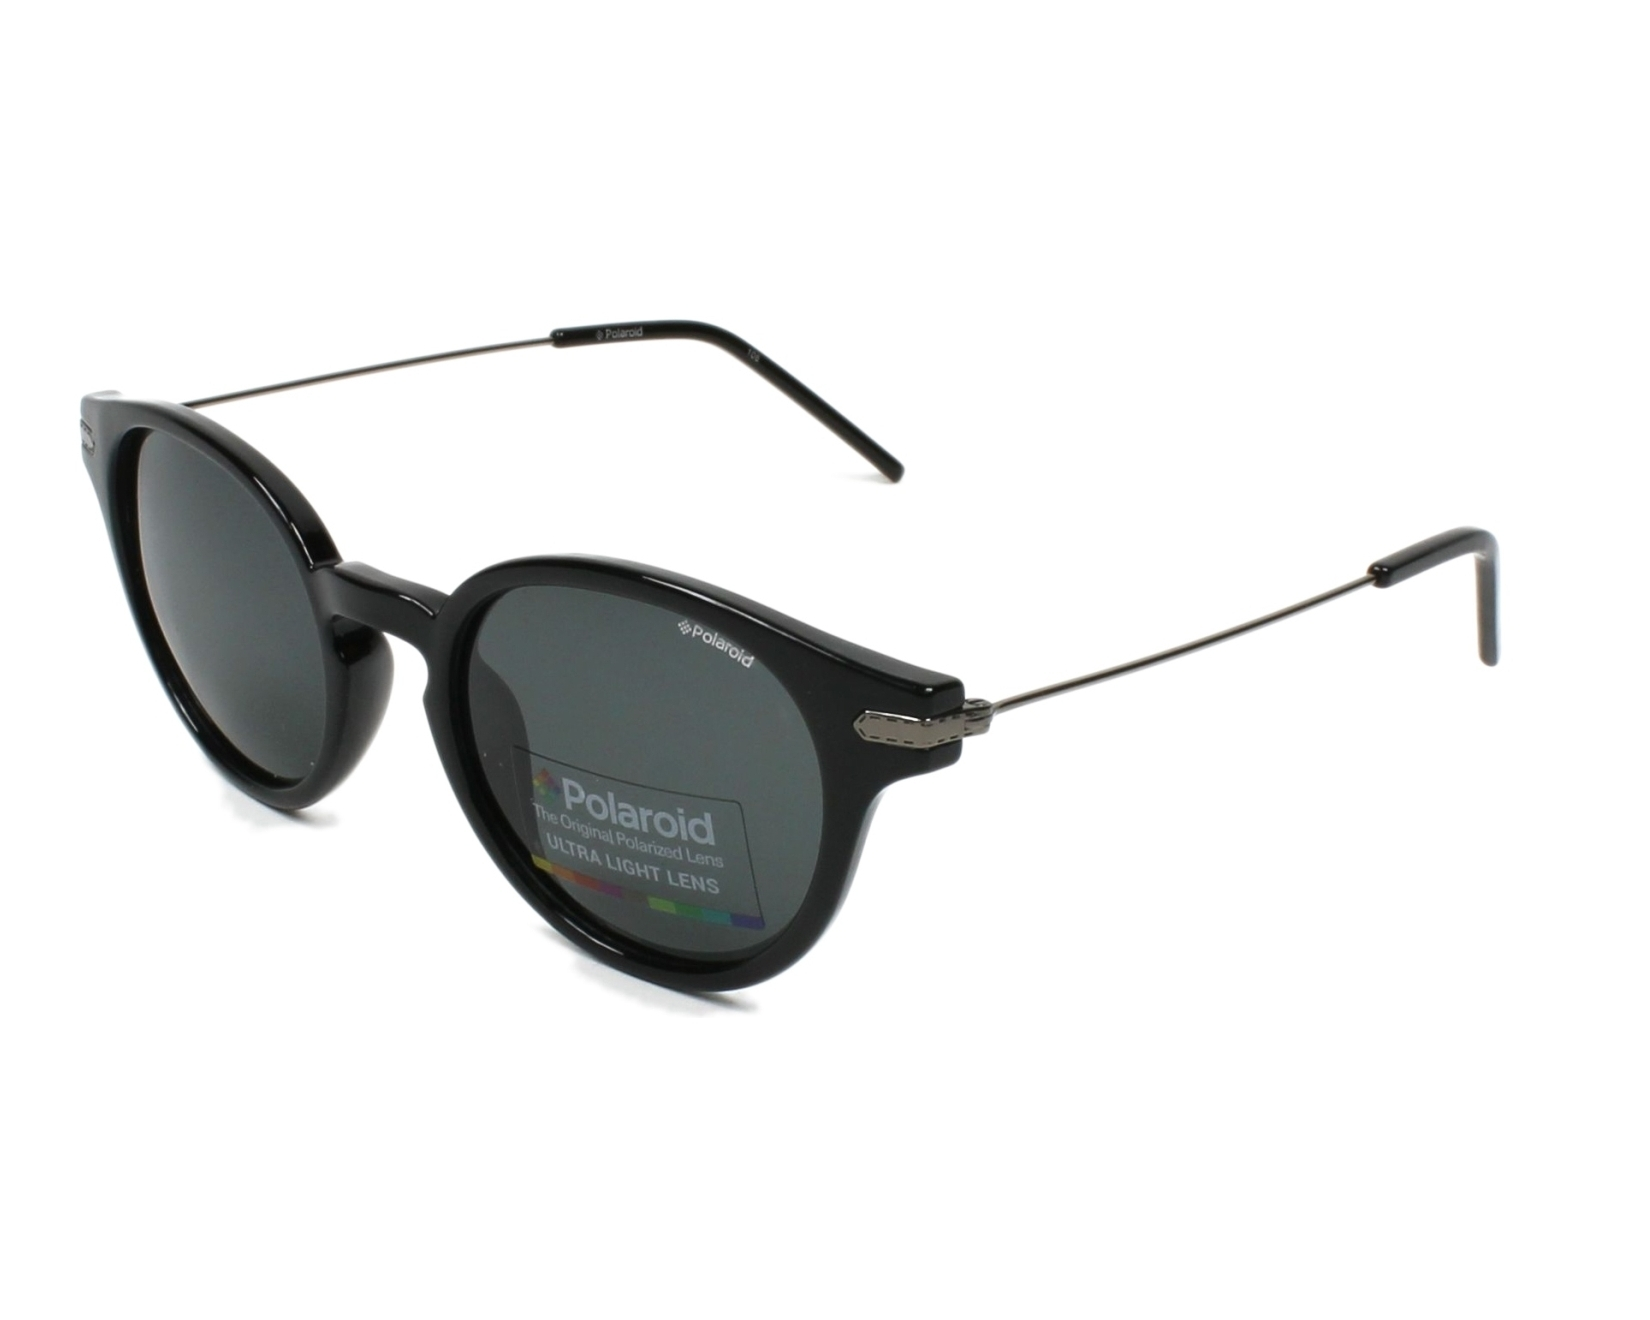 Polaroid pld 1026/S cvs y2 Sonnenbrille XqHTmaa